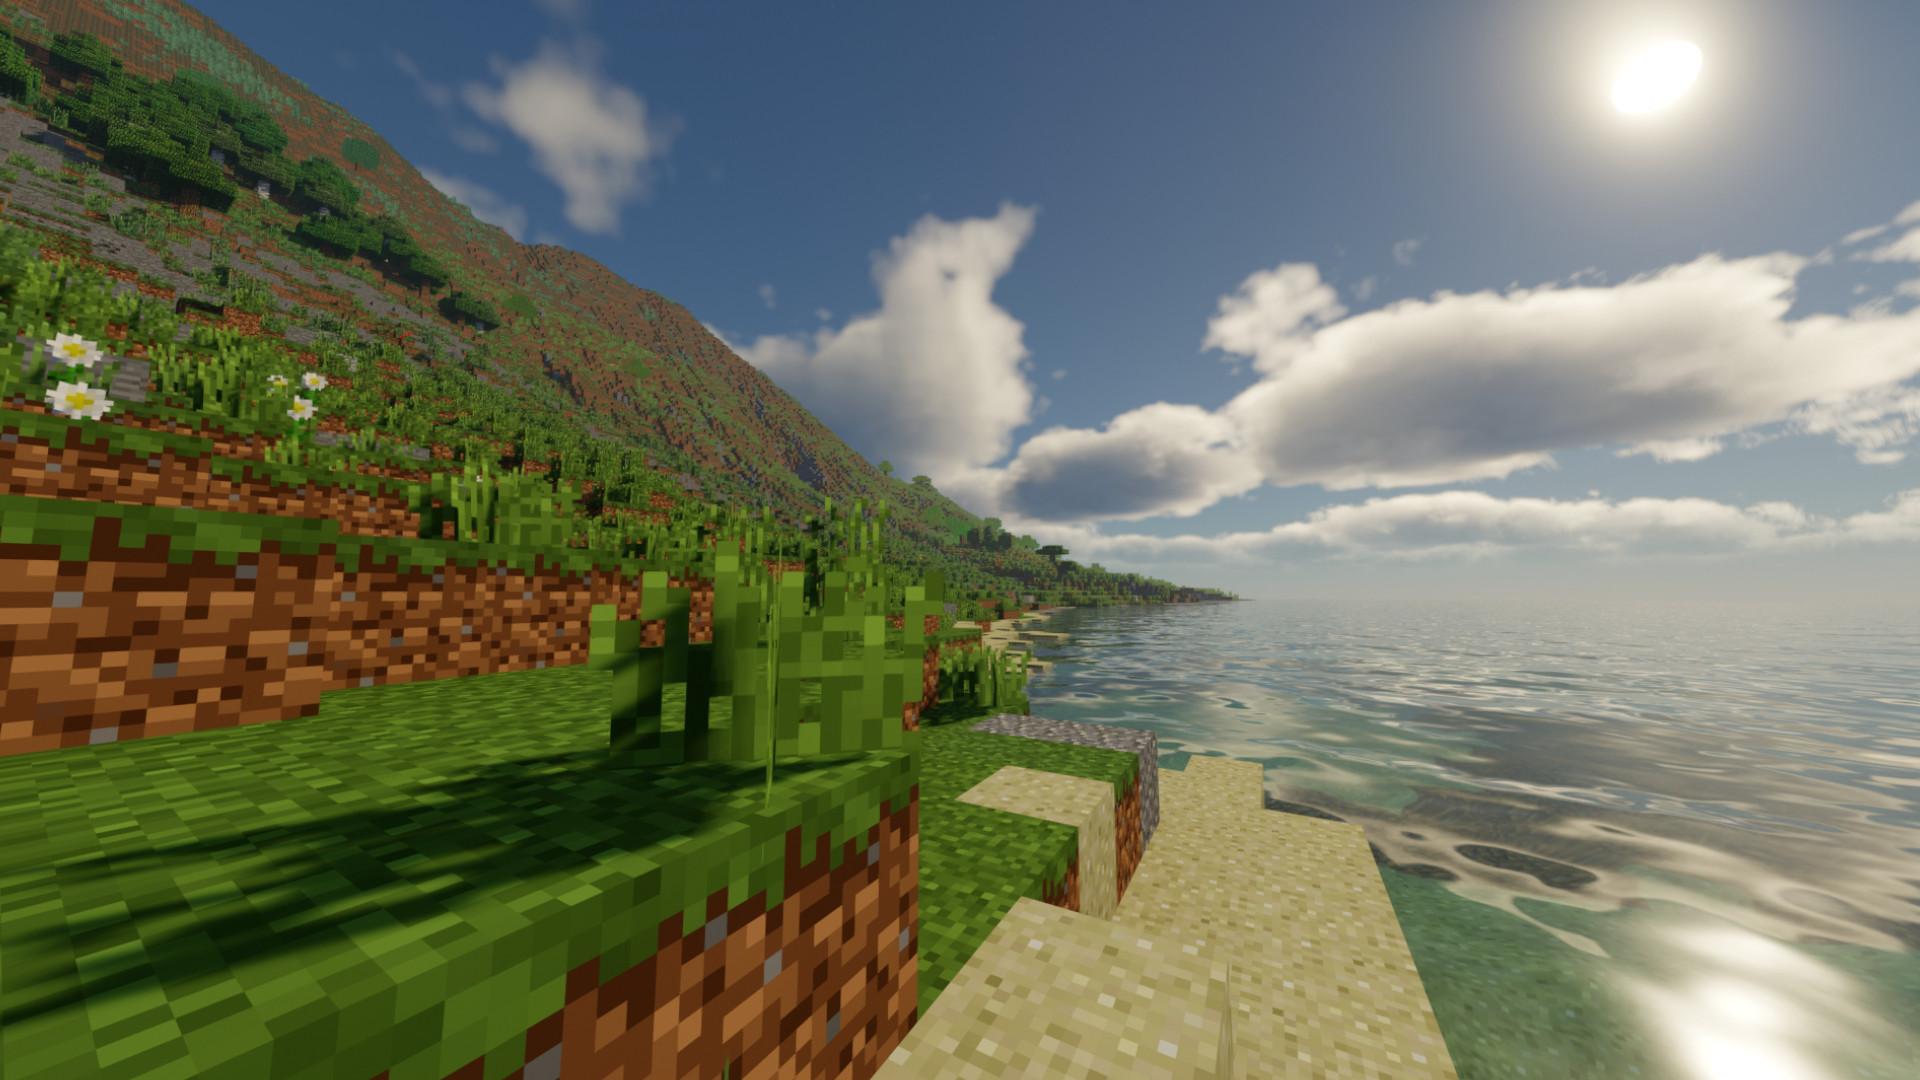 Minecraft player uses NASA data to create a 1:45 scale Hawaiian Islands map